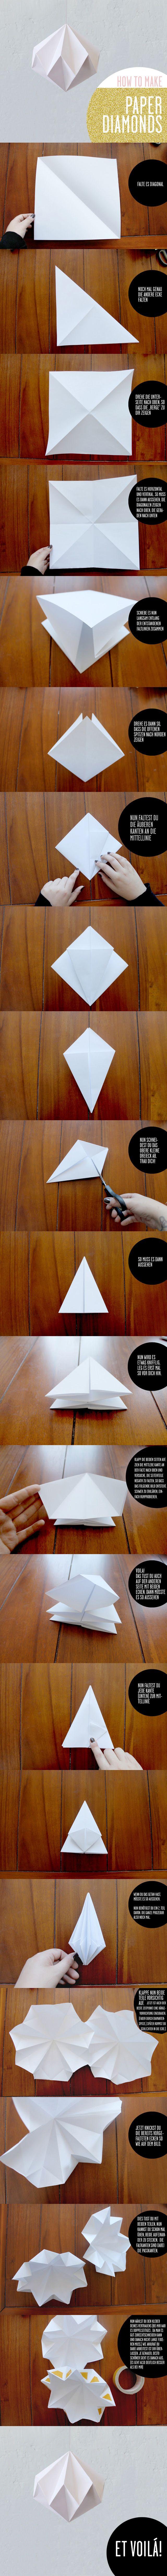 Diamant en origami ann-meer.blogspot.com